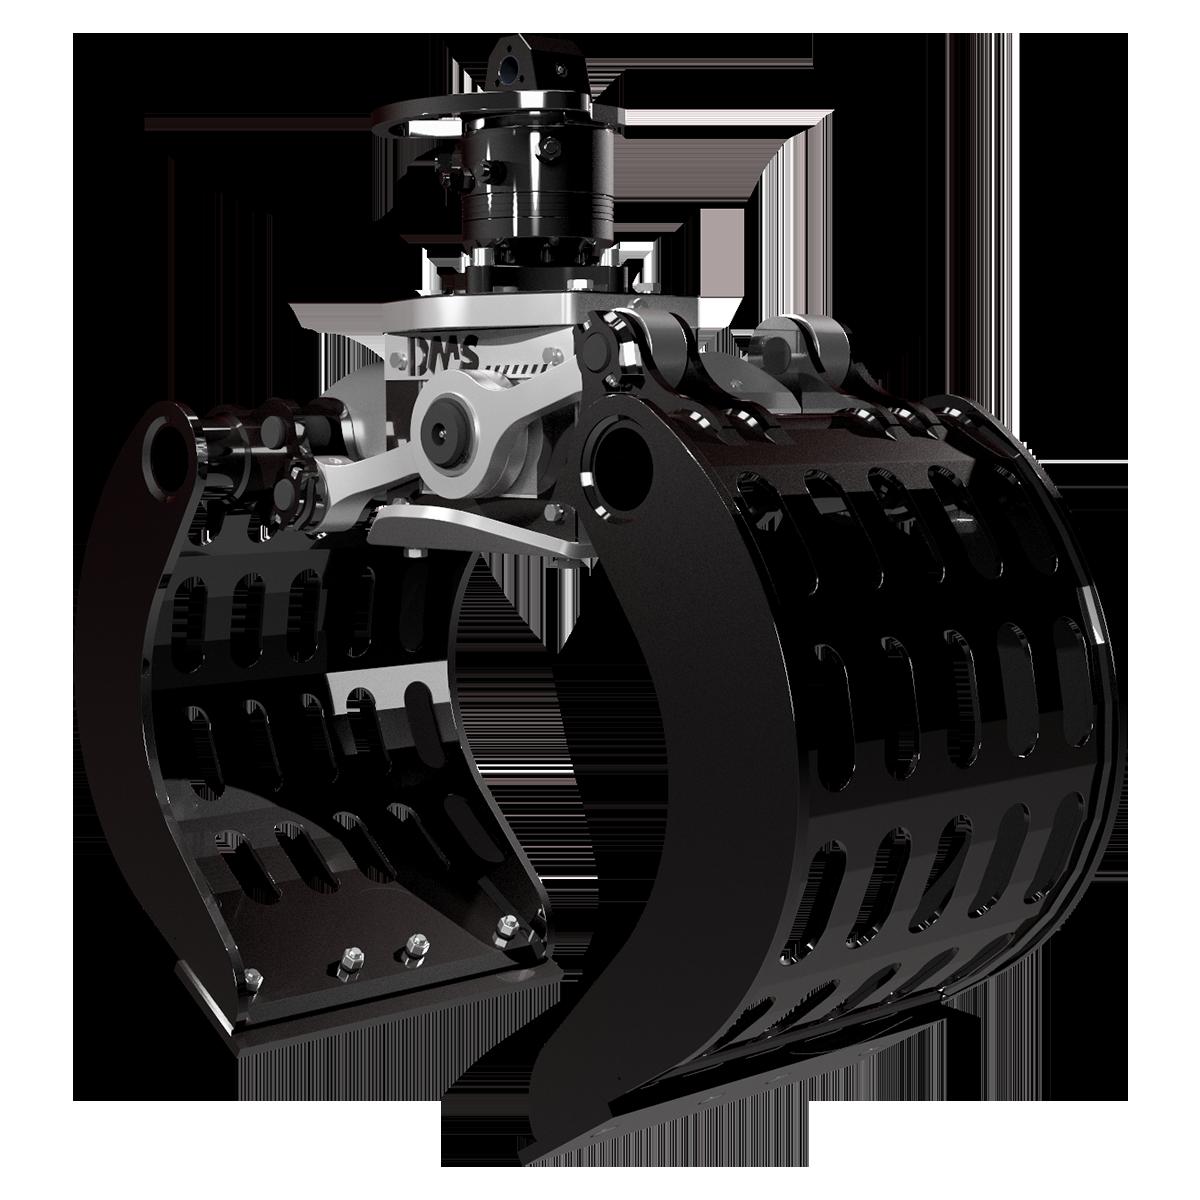 Ladekran Abbruchgreifer AG9050p von DMS Technologie